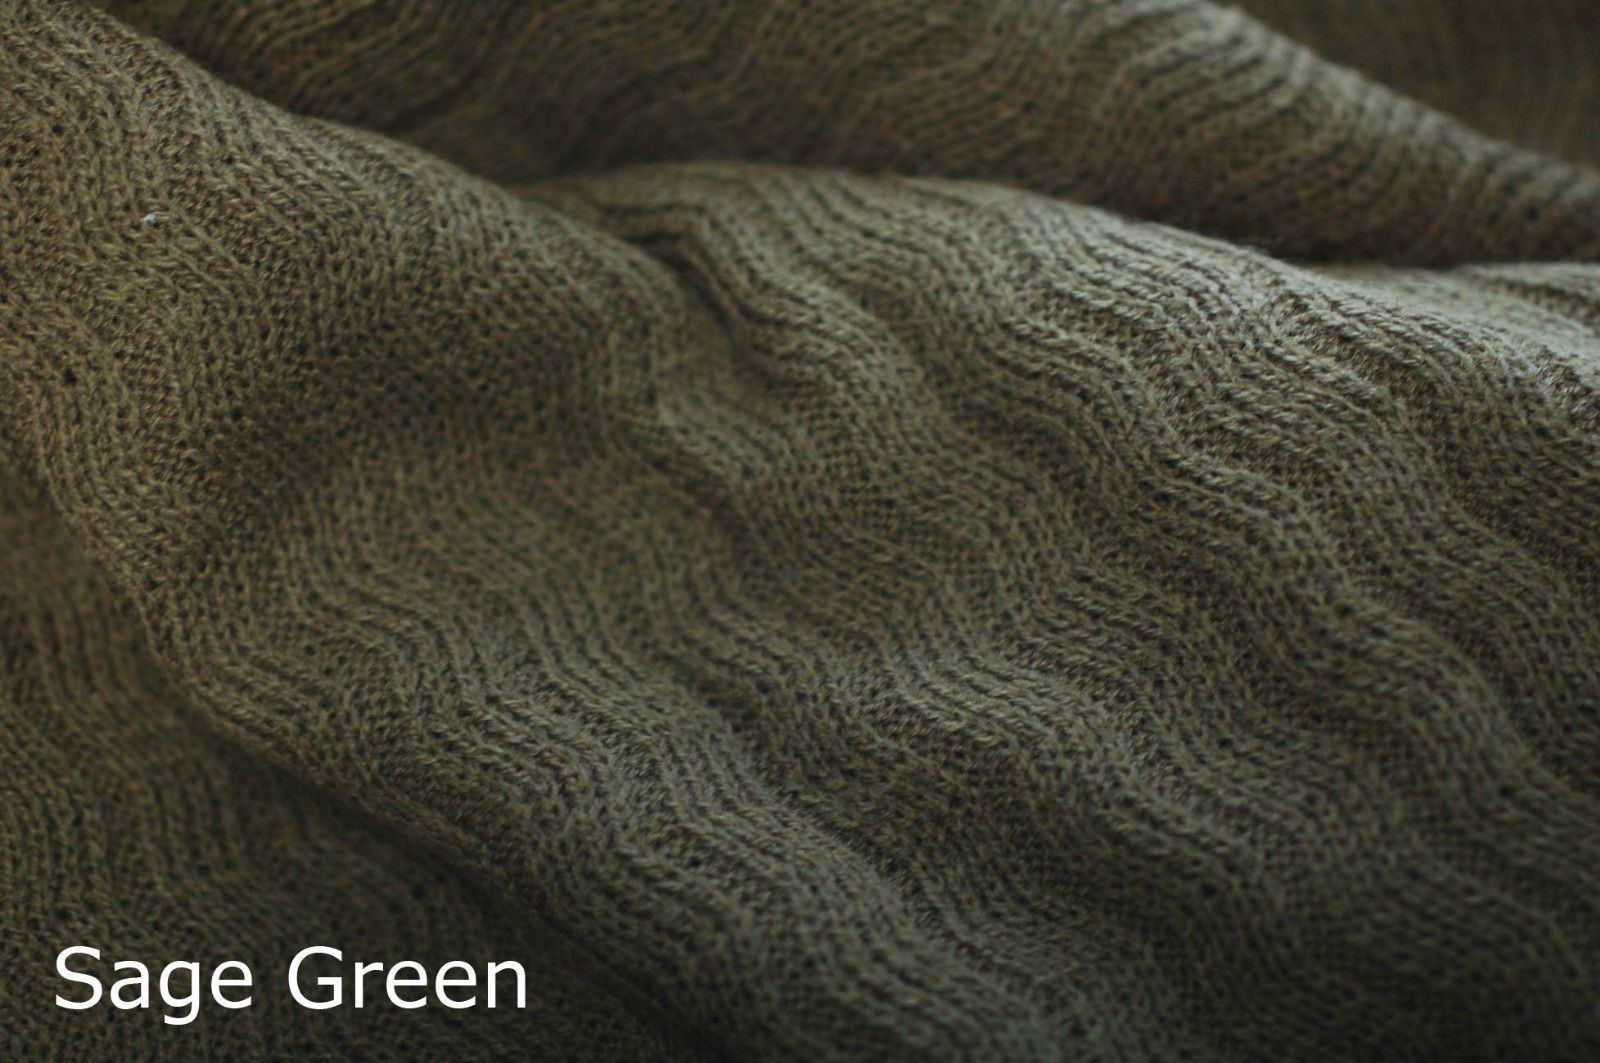 neotrims einfarbiges muster strick jersey stoff material meterware motiv ebay. Black Bedroom Furniture Sets. Home Design Ideas